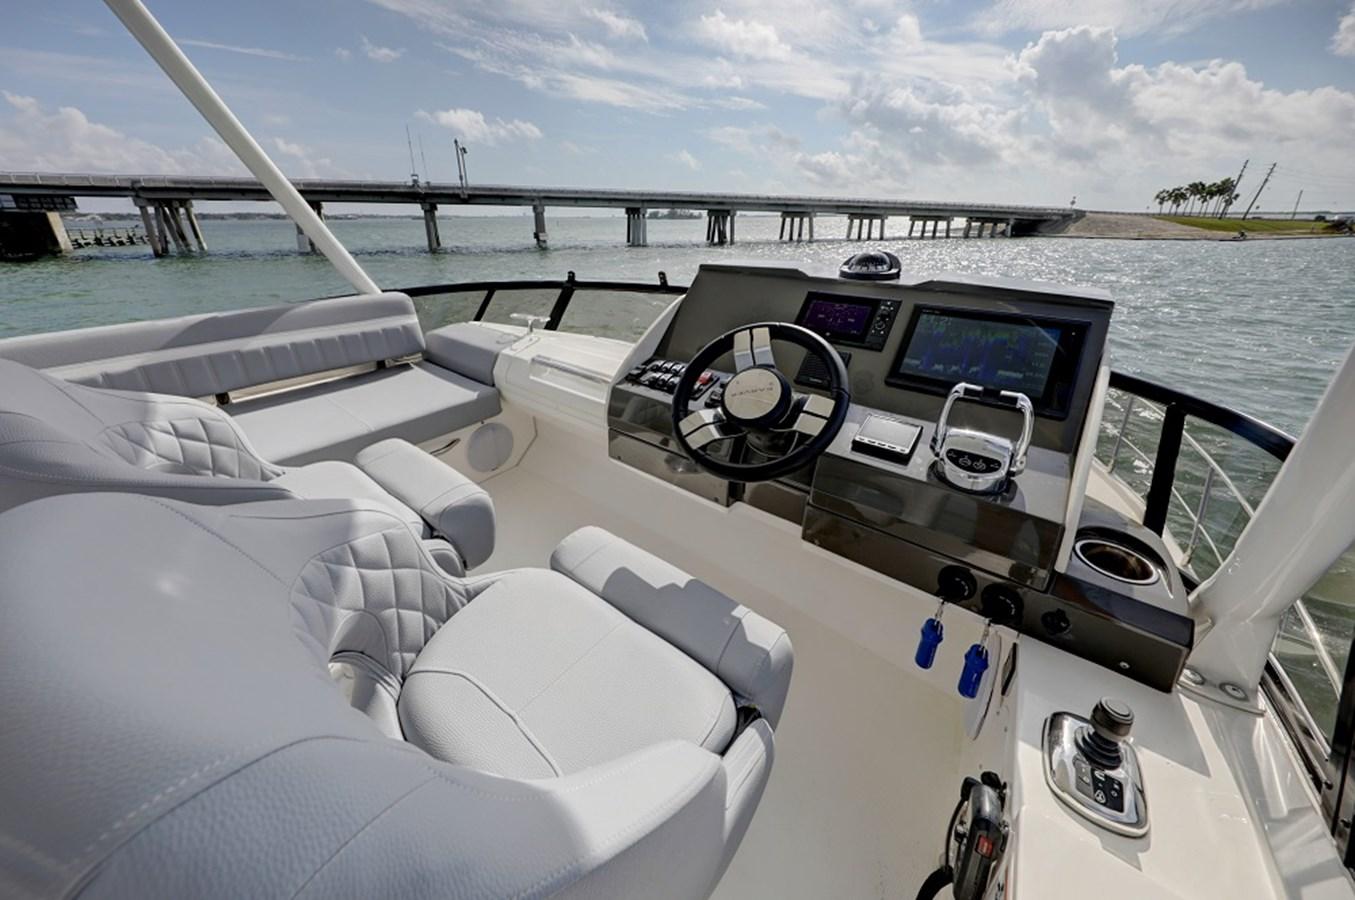 B44A5577_78_79_80_81 2020 CARVER C40 Command Bridge Motor Yacht 2825117